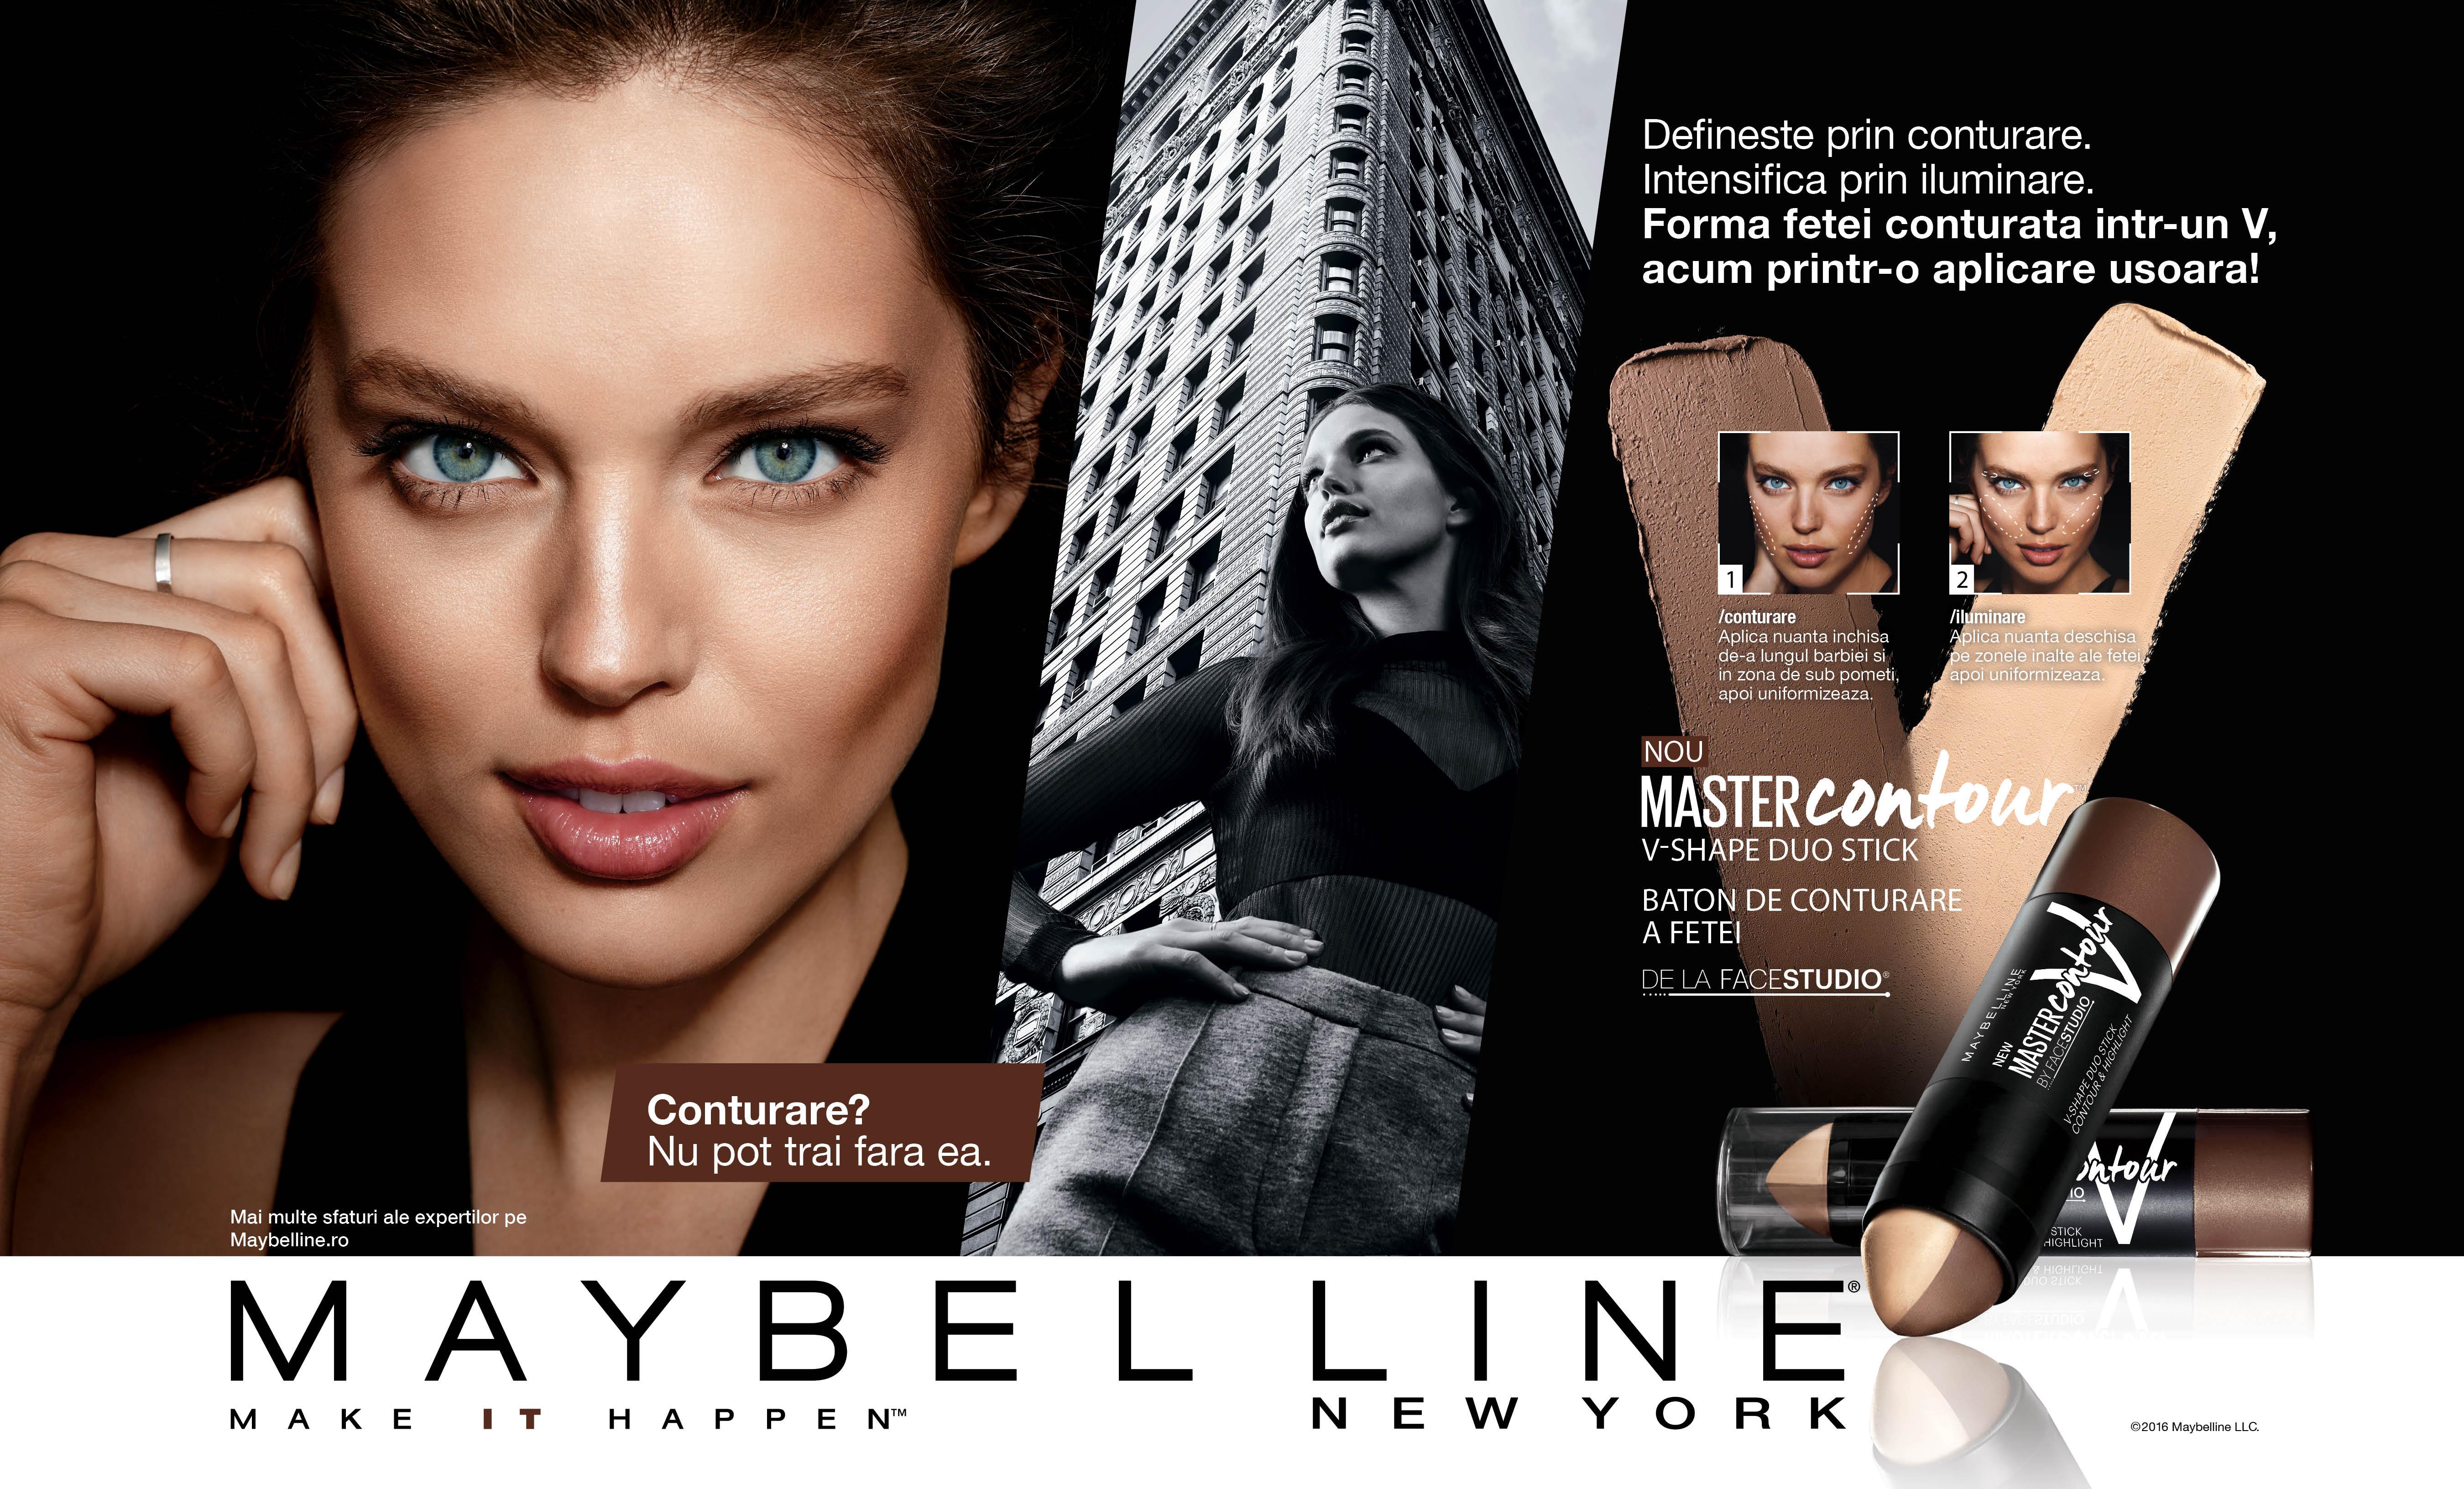 Baton de conturare a fetei Maybelline Master Contour V Shape Duo, 02 MEDIUM 3